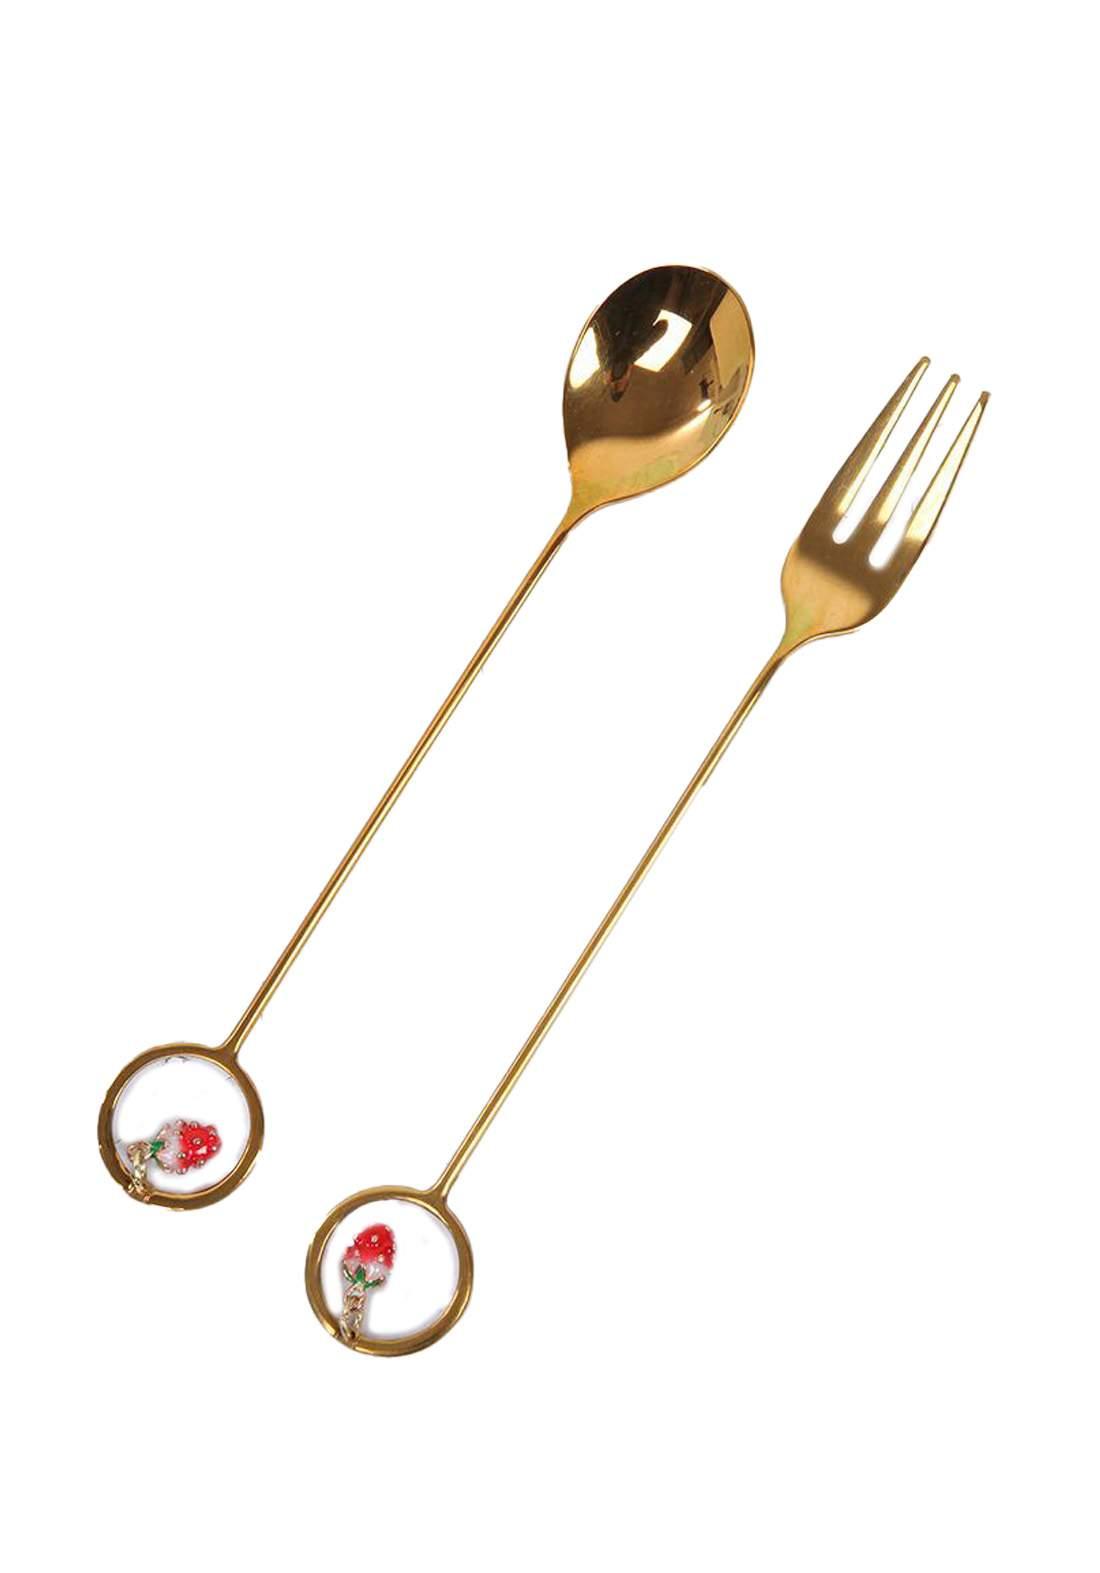 Spoon & Fork ملعقة مع شوكة